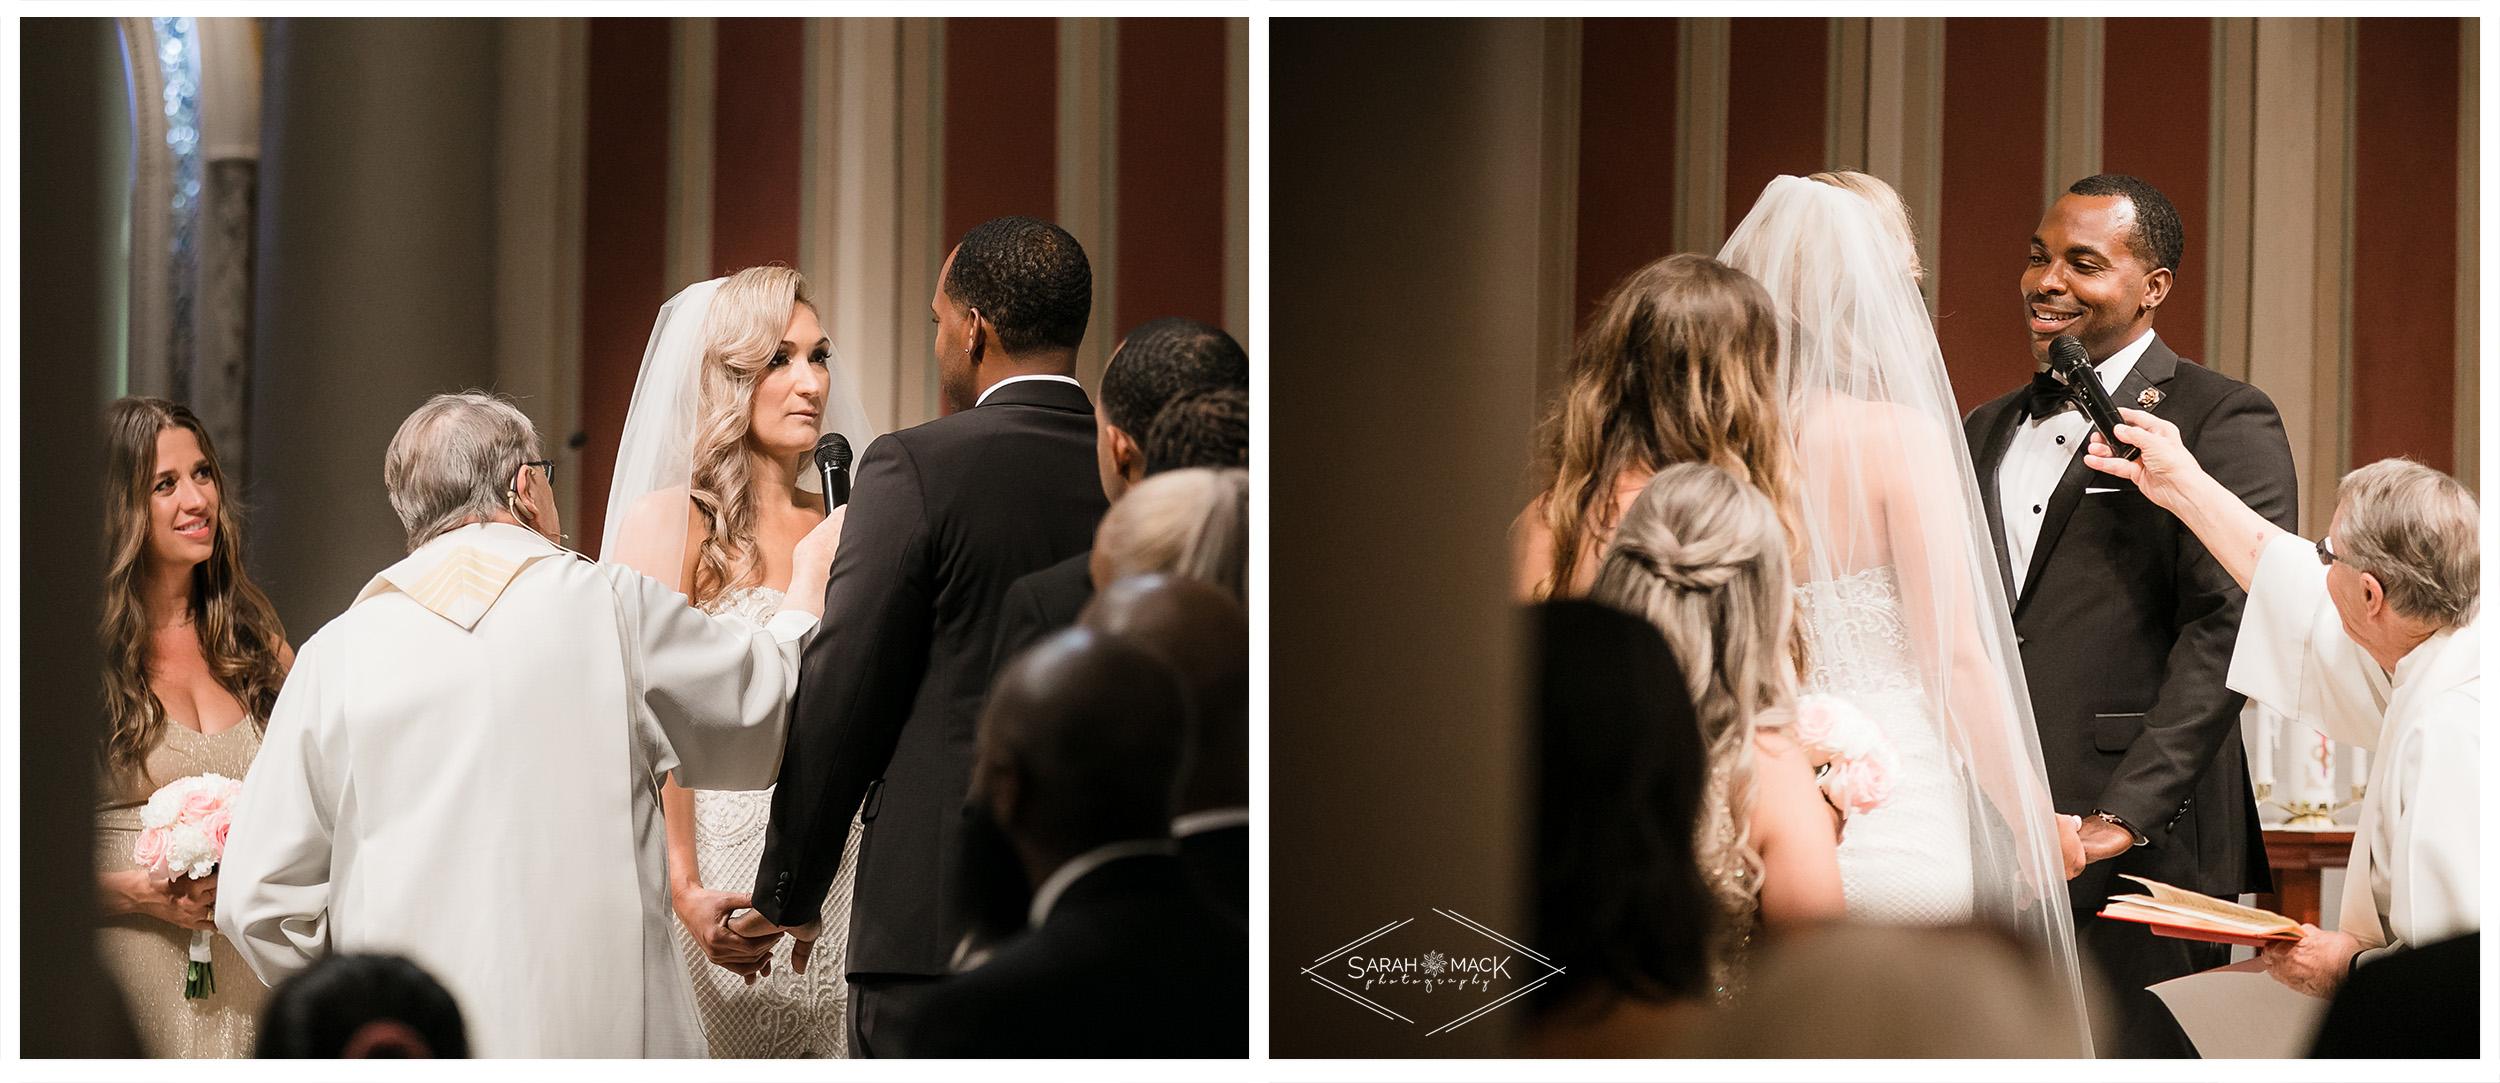 MK-Santa-Monica-Catholic-Church-Wedding-Photography-29.jpg